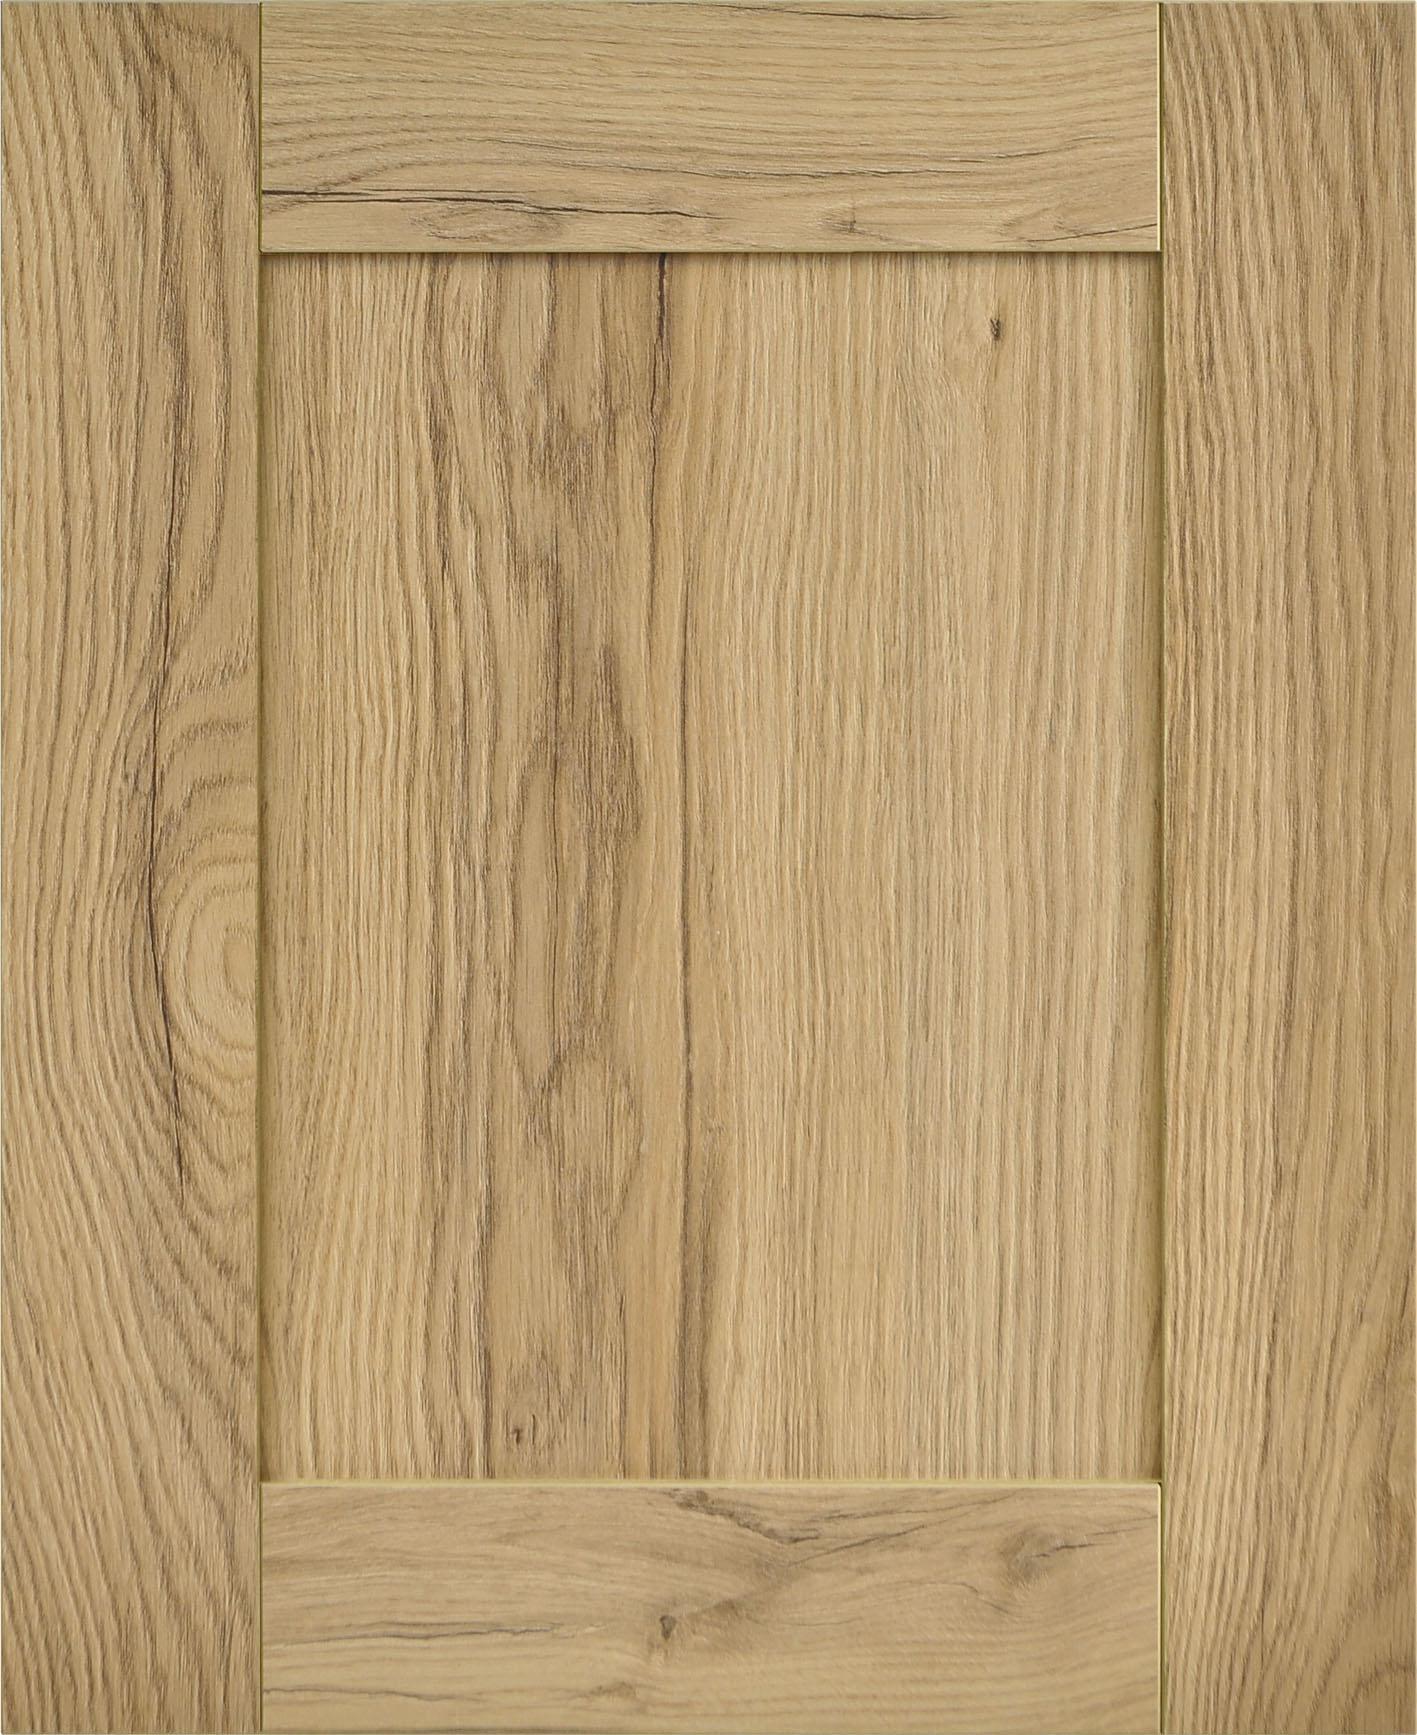 Square Frame 1580-SQ